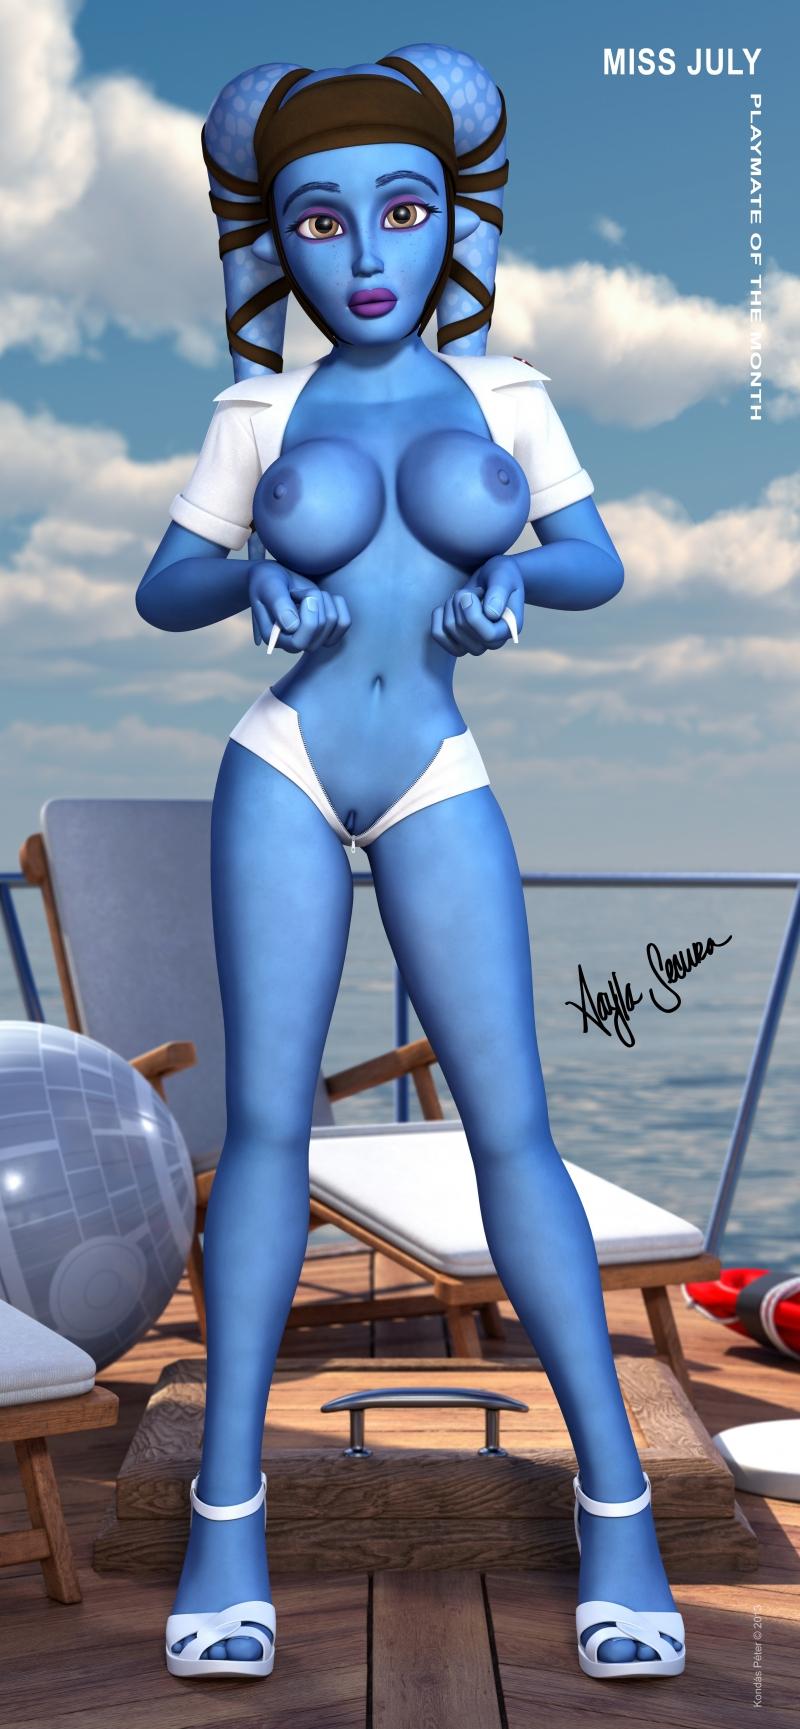 1169847 - Aayla_Secura Playboy Star_Wars Twi'lek kondaspeter.jpg